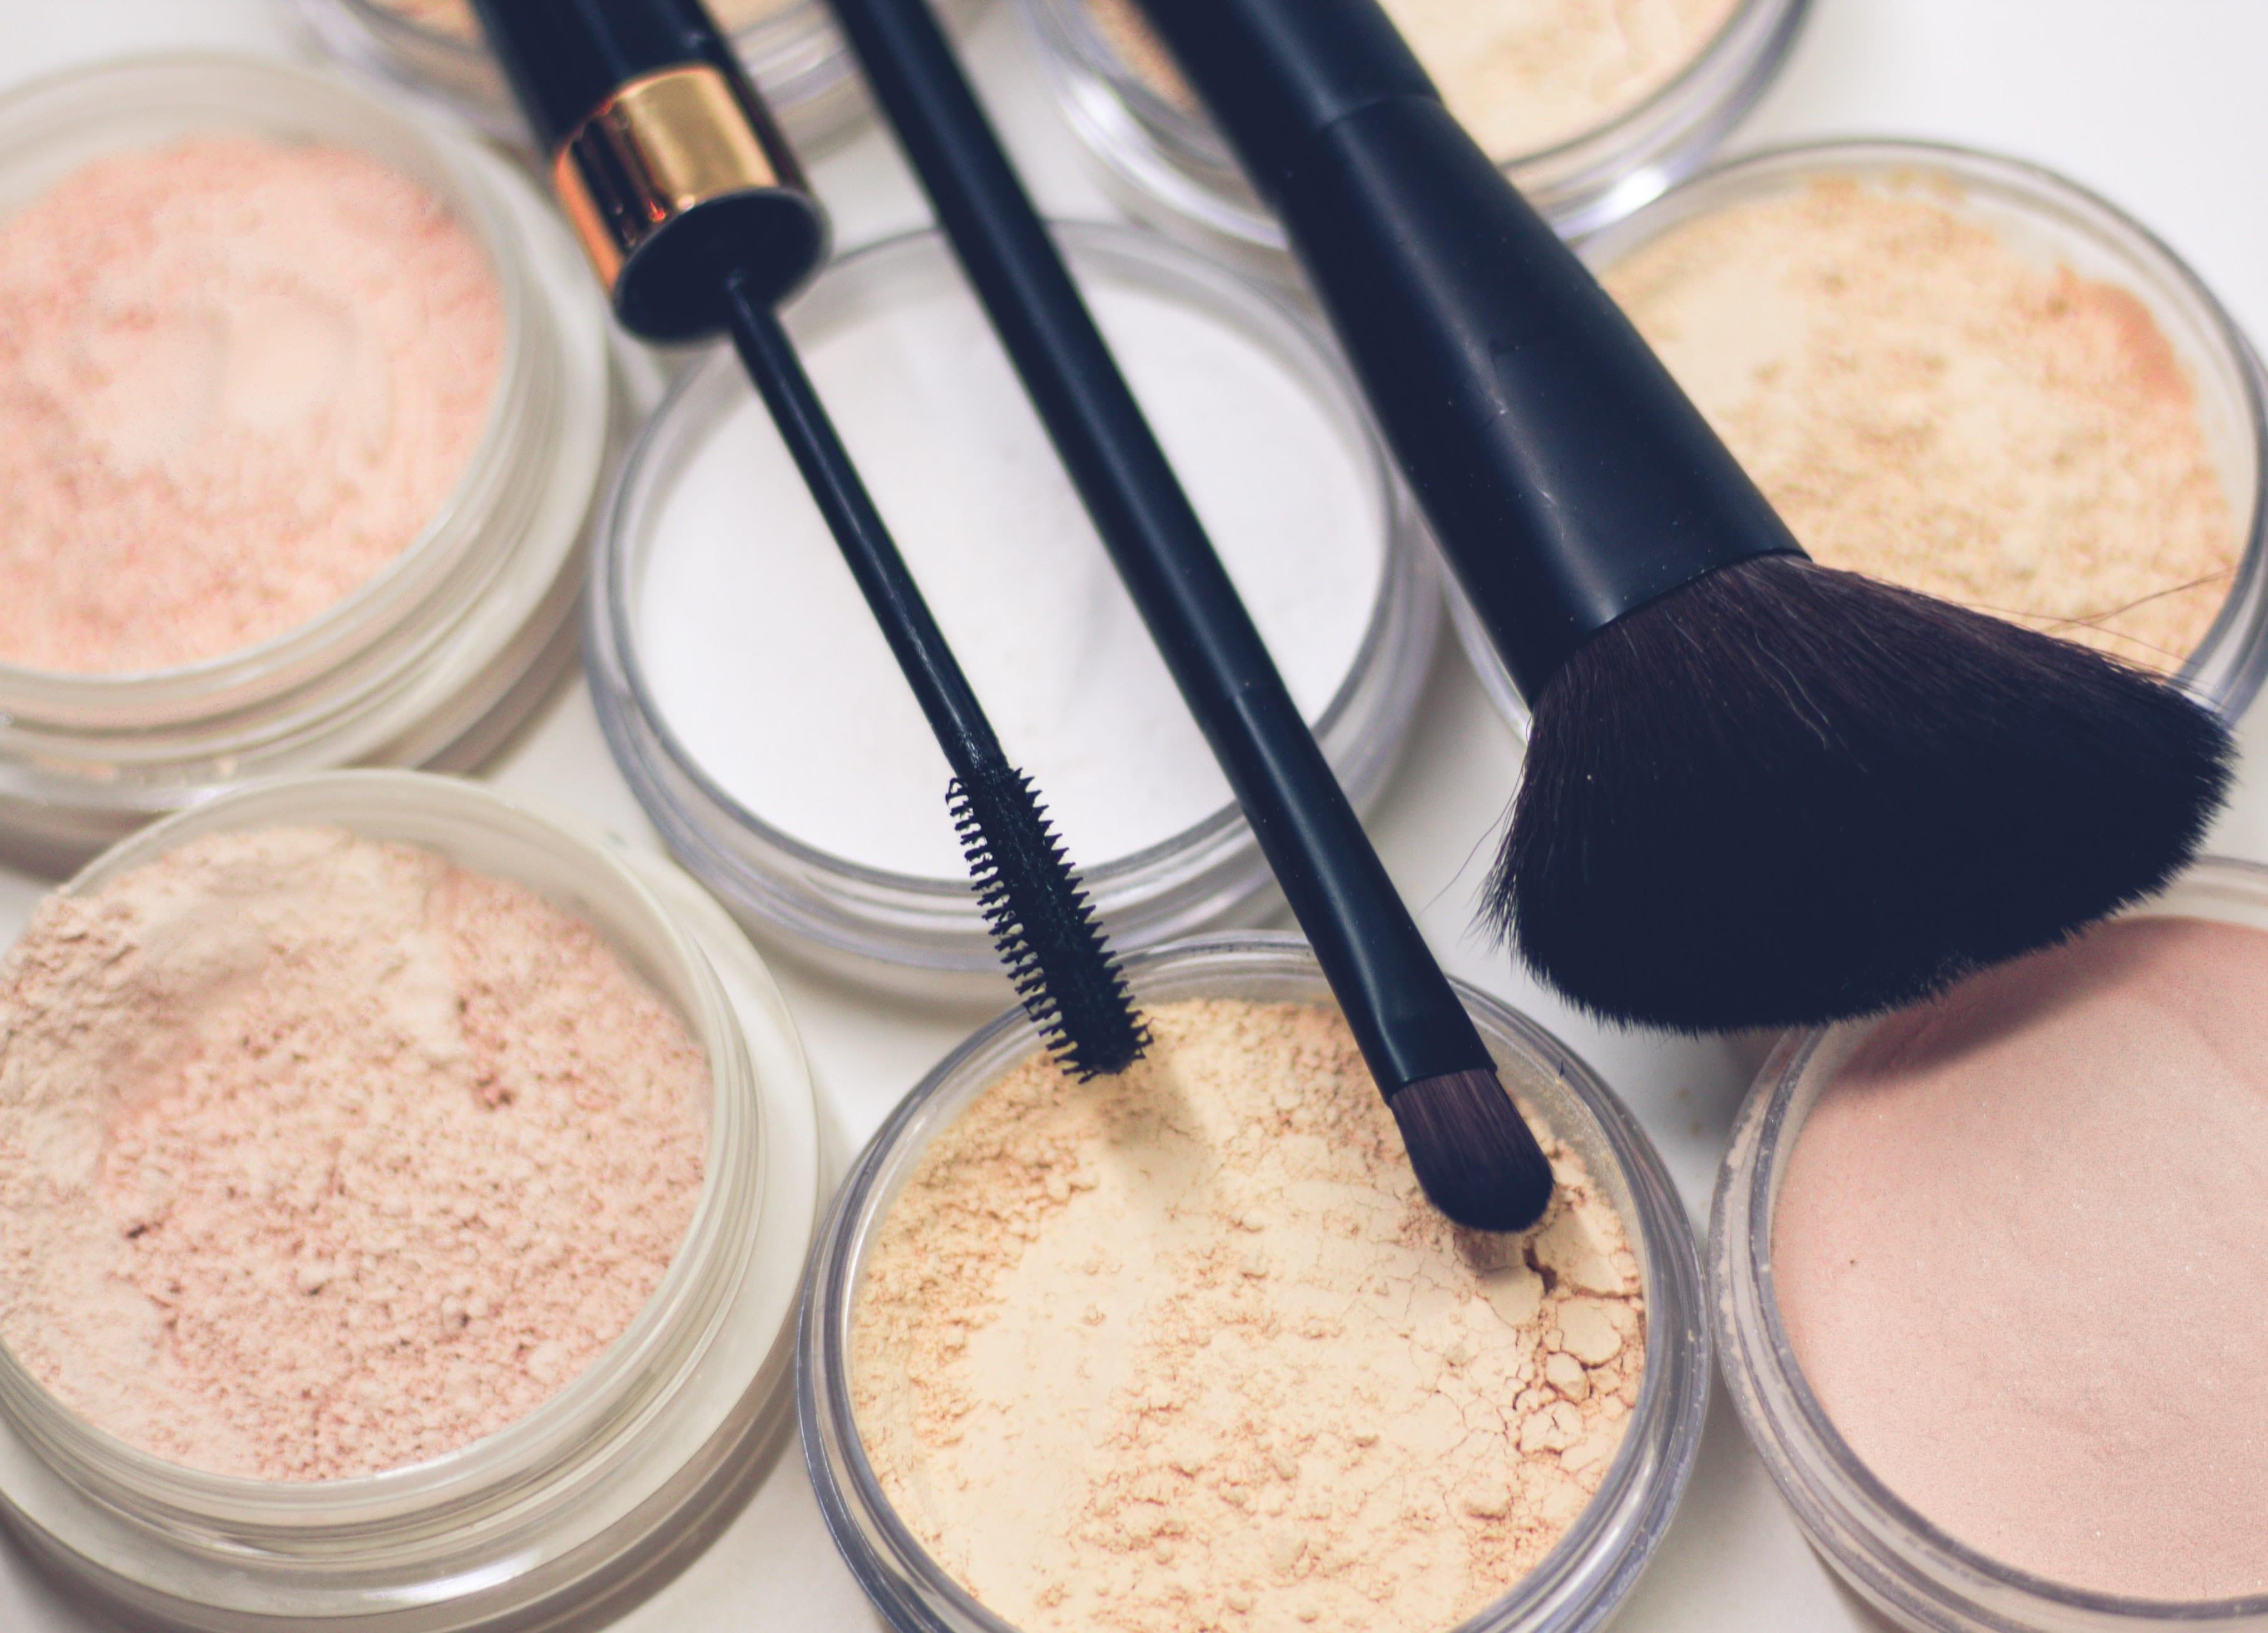 various powder shades with makeup brushes.